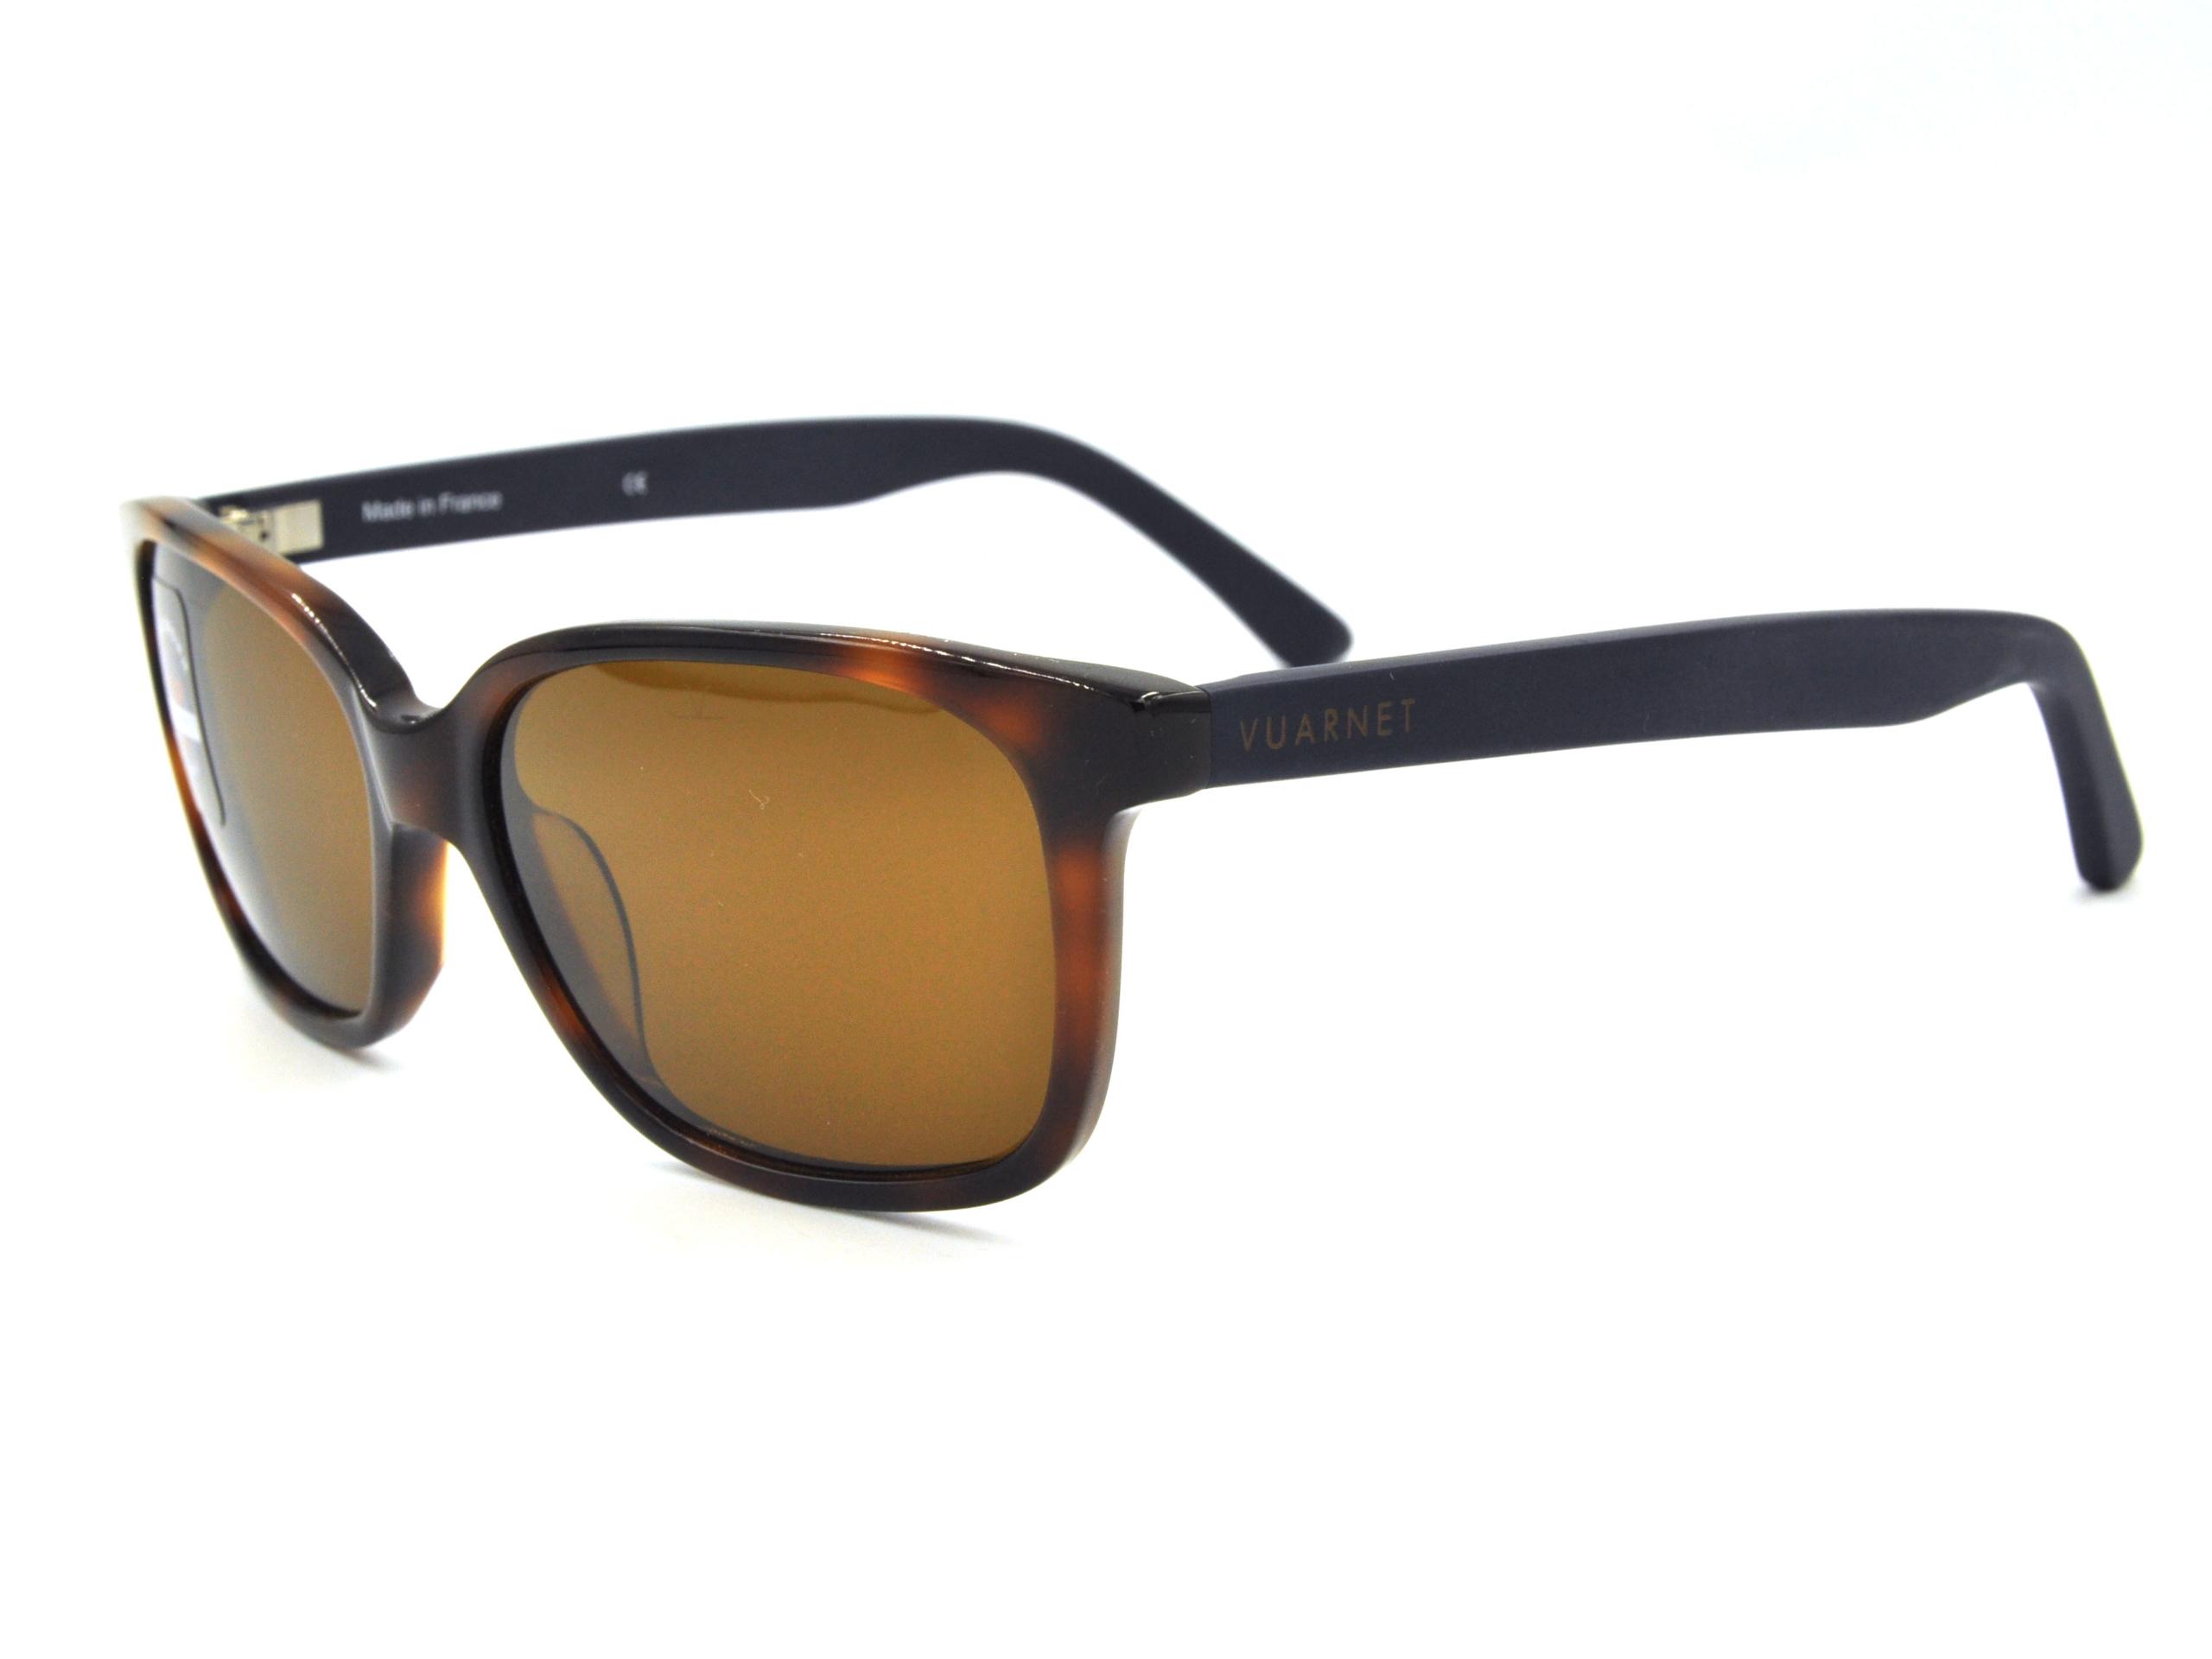 VUARNET VL1302 0002 Sunglasses 2020